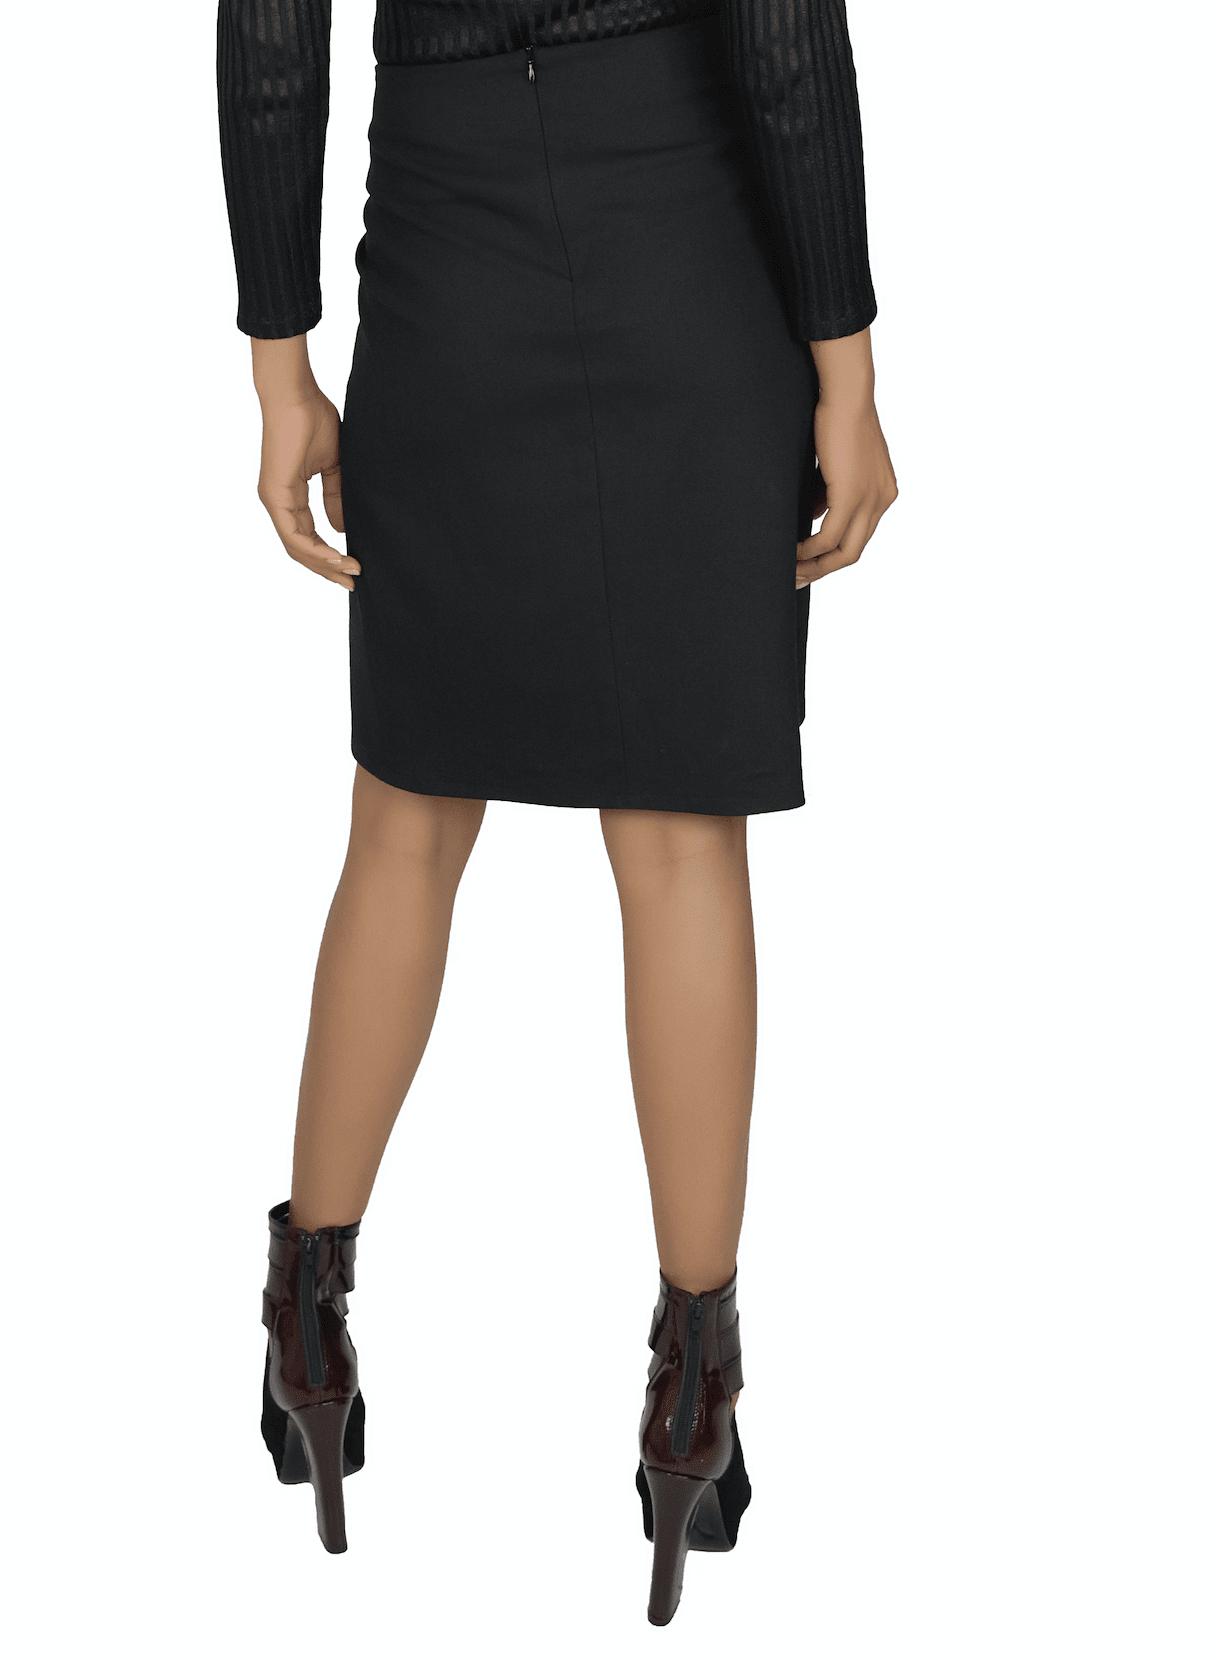 Skirt VENATICI 2